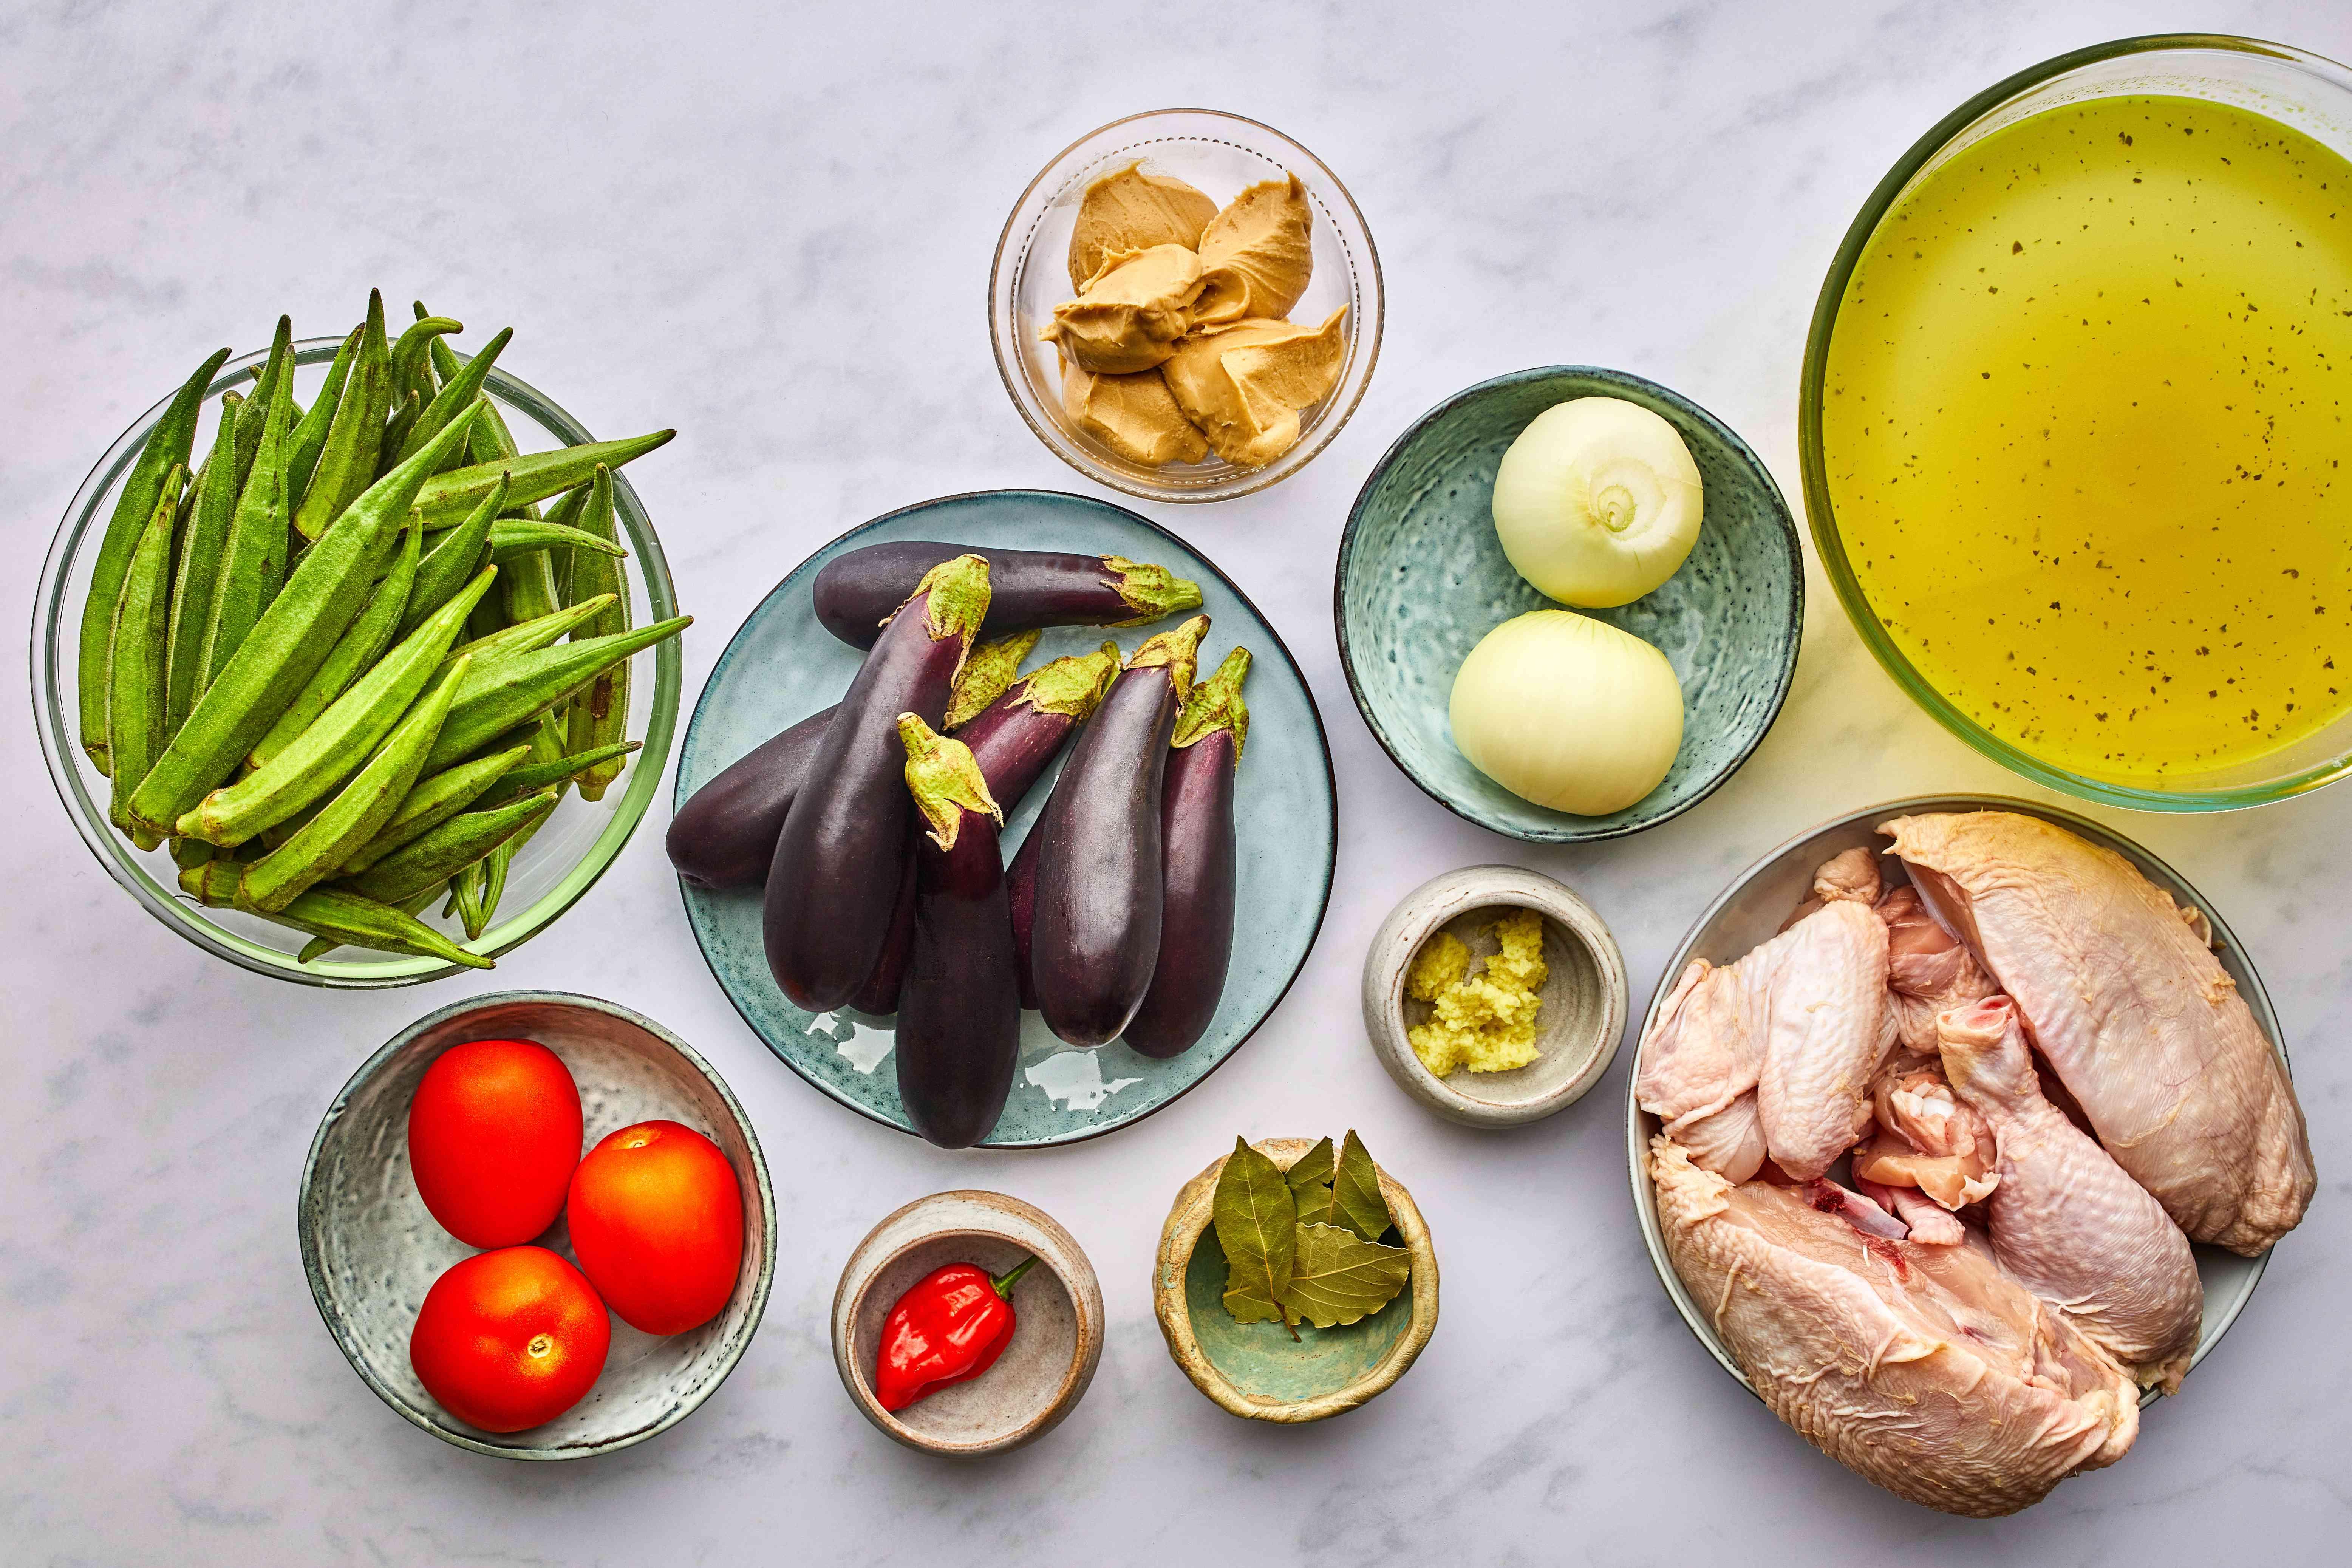 Peanut Butter Soup Recipe ingredients